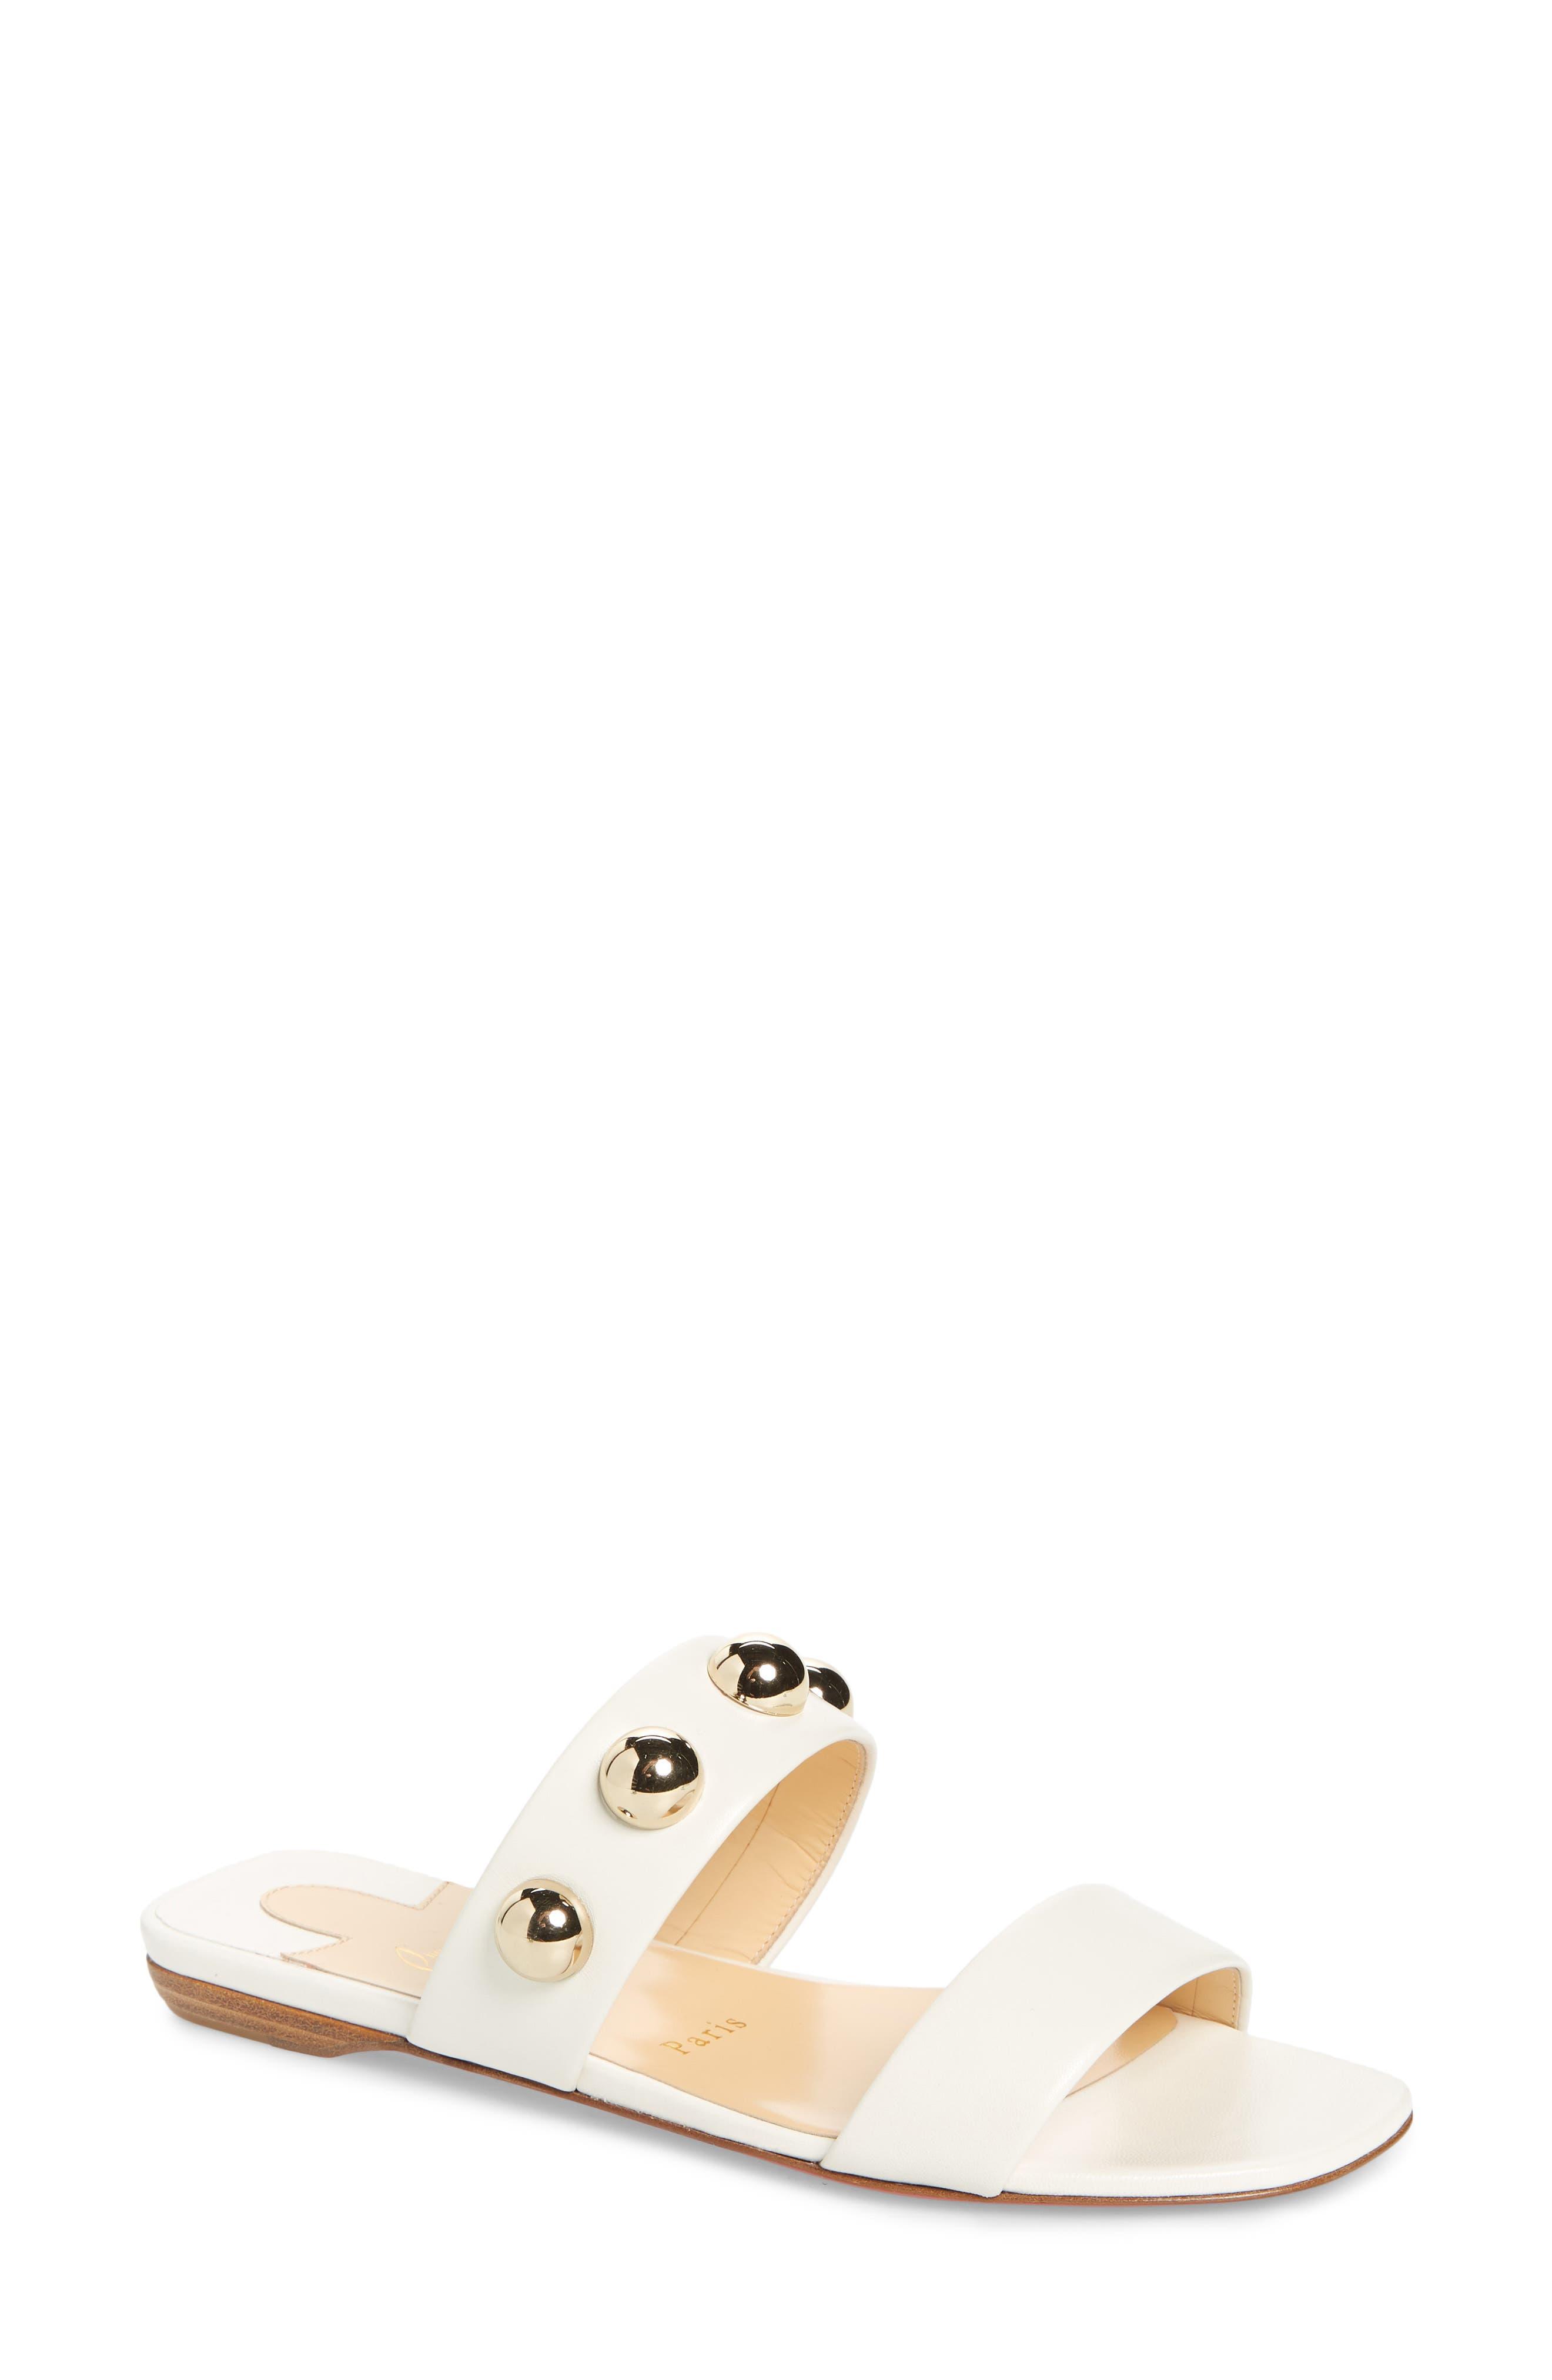 Christian Louboutin Simple Bille Ornament Slide Sandal (Women)